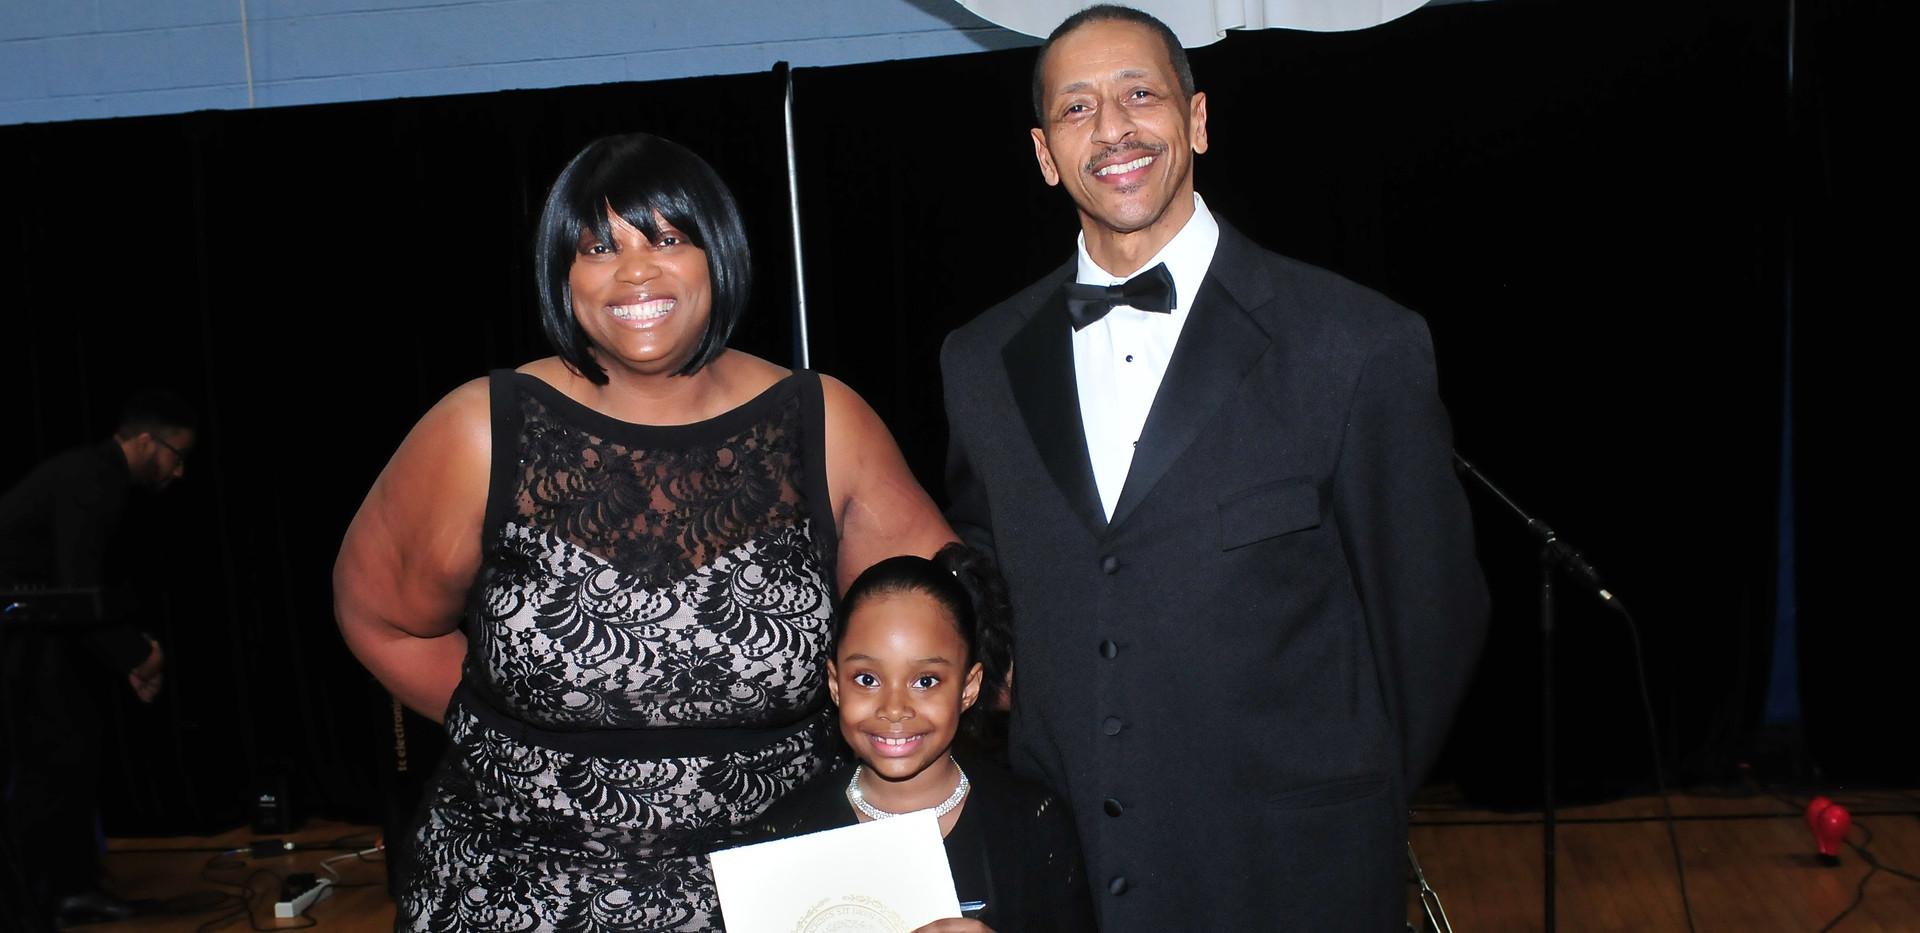 Honoree Stardom R. Brown Blakey